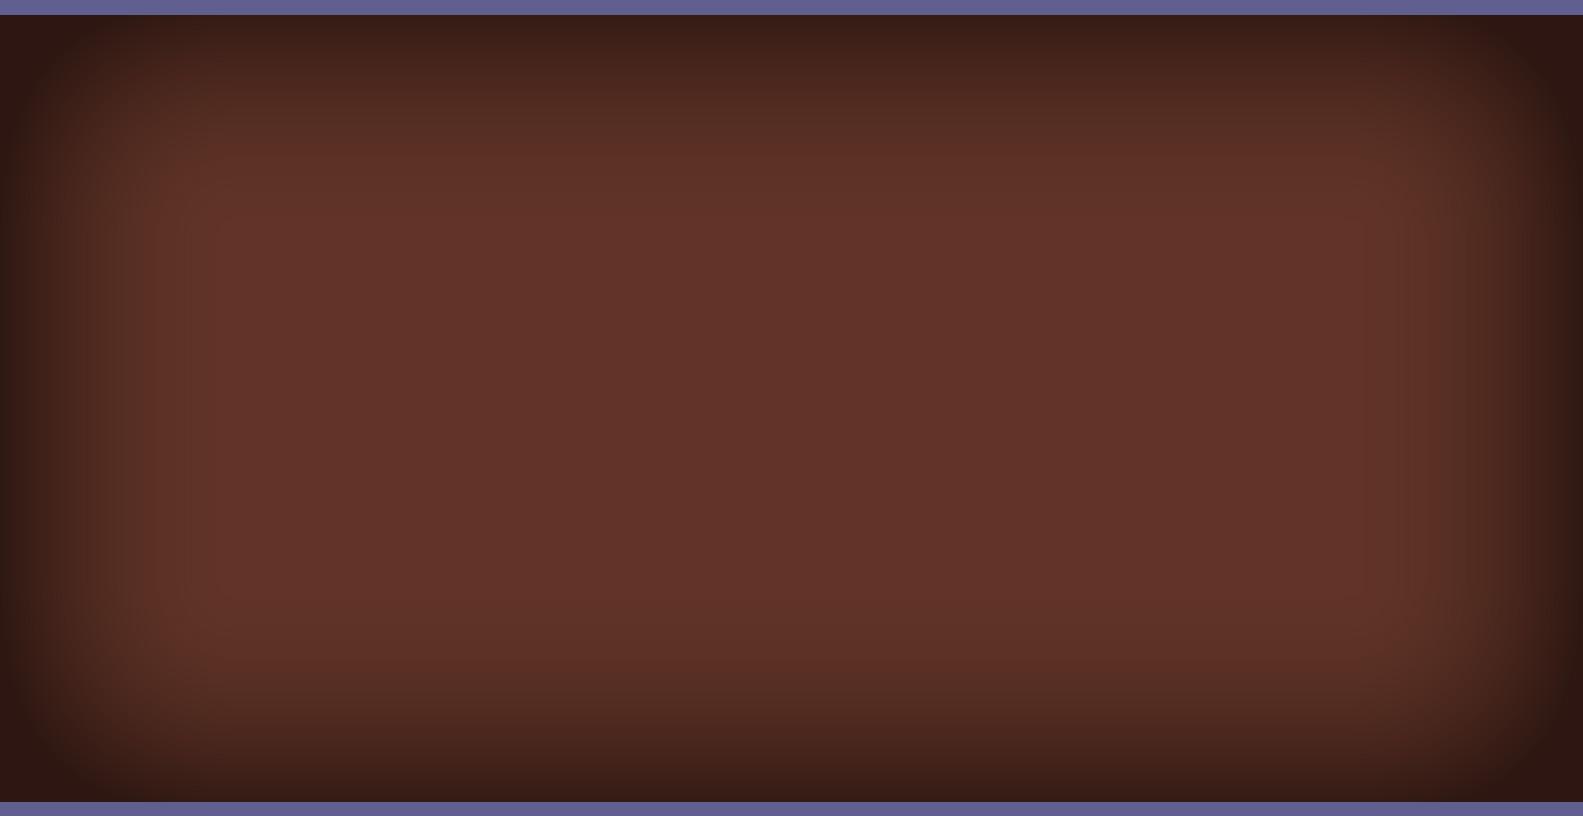 Chocolate Brown Wallpaper 19 Background Wallpaper   Hivewallpapercom 1583x816